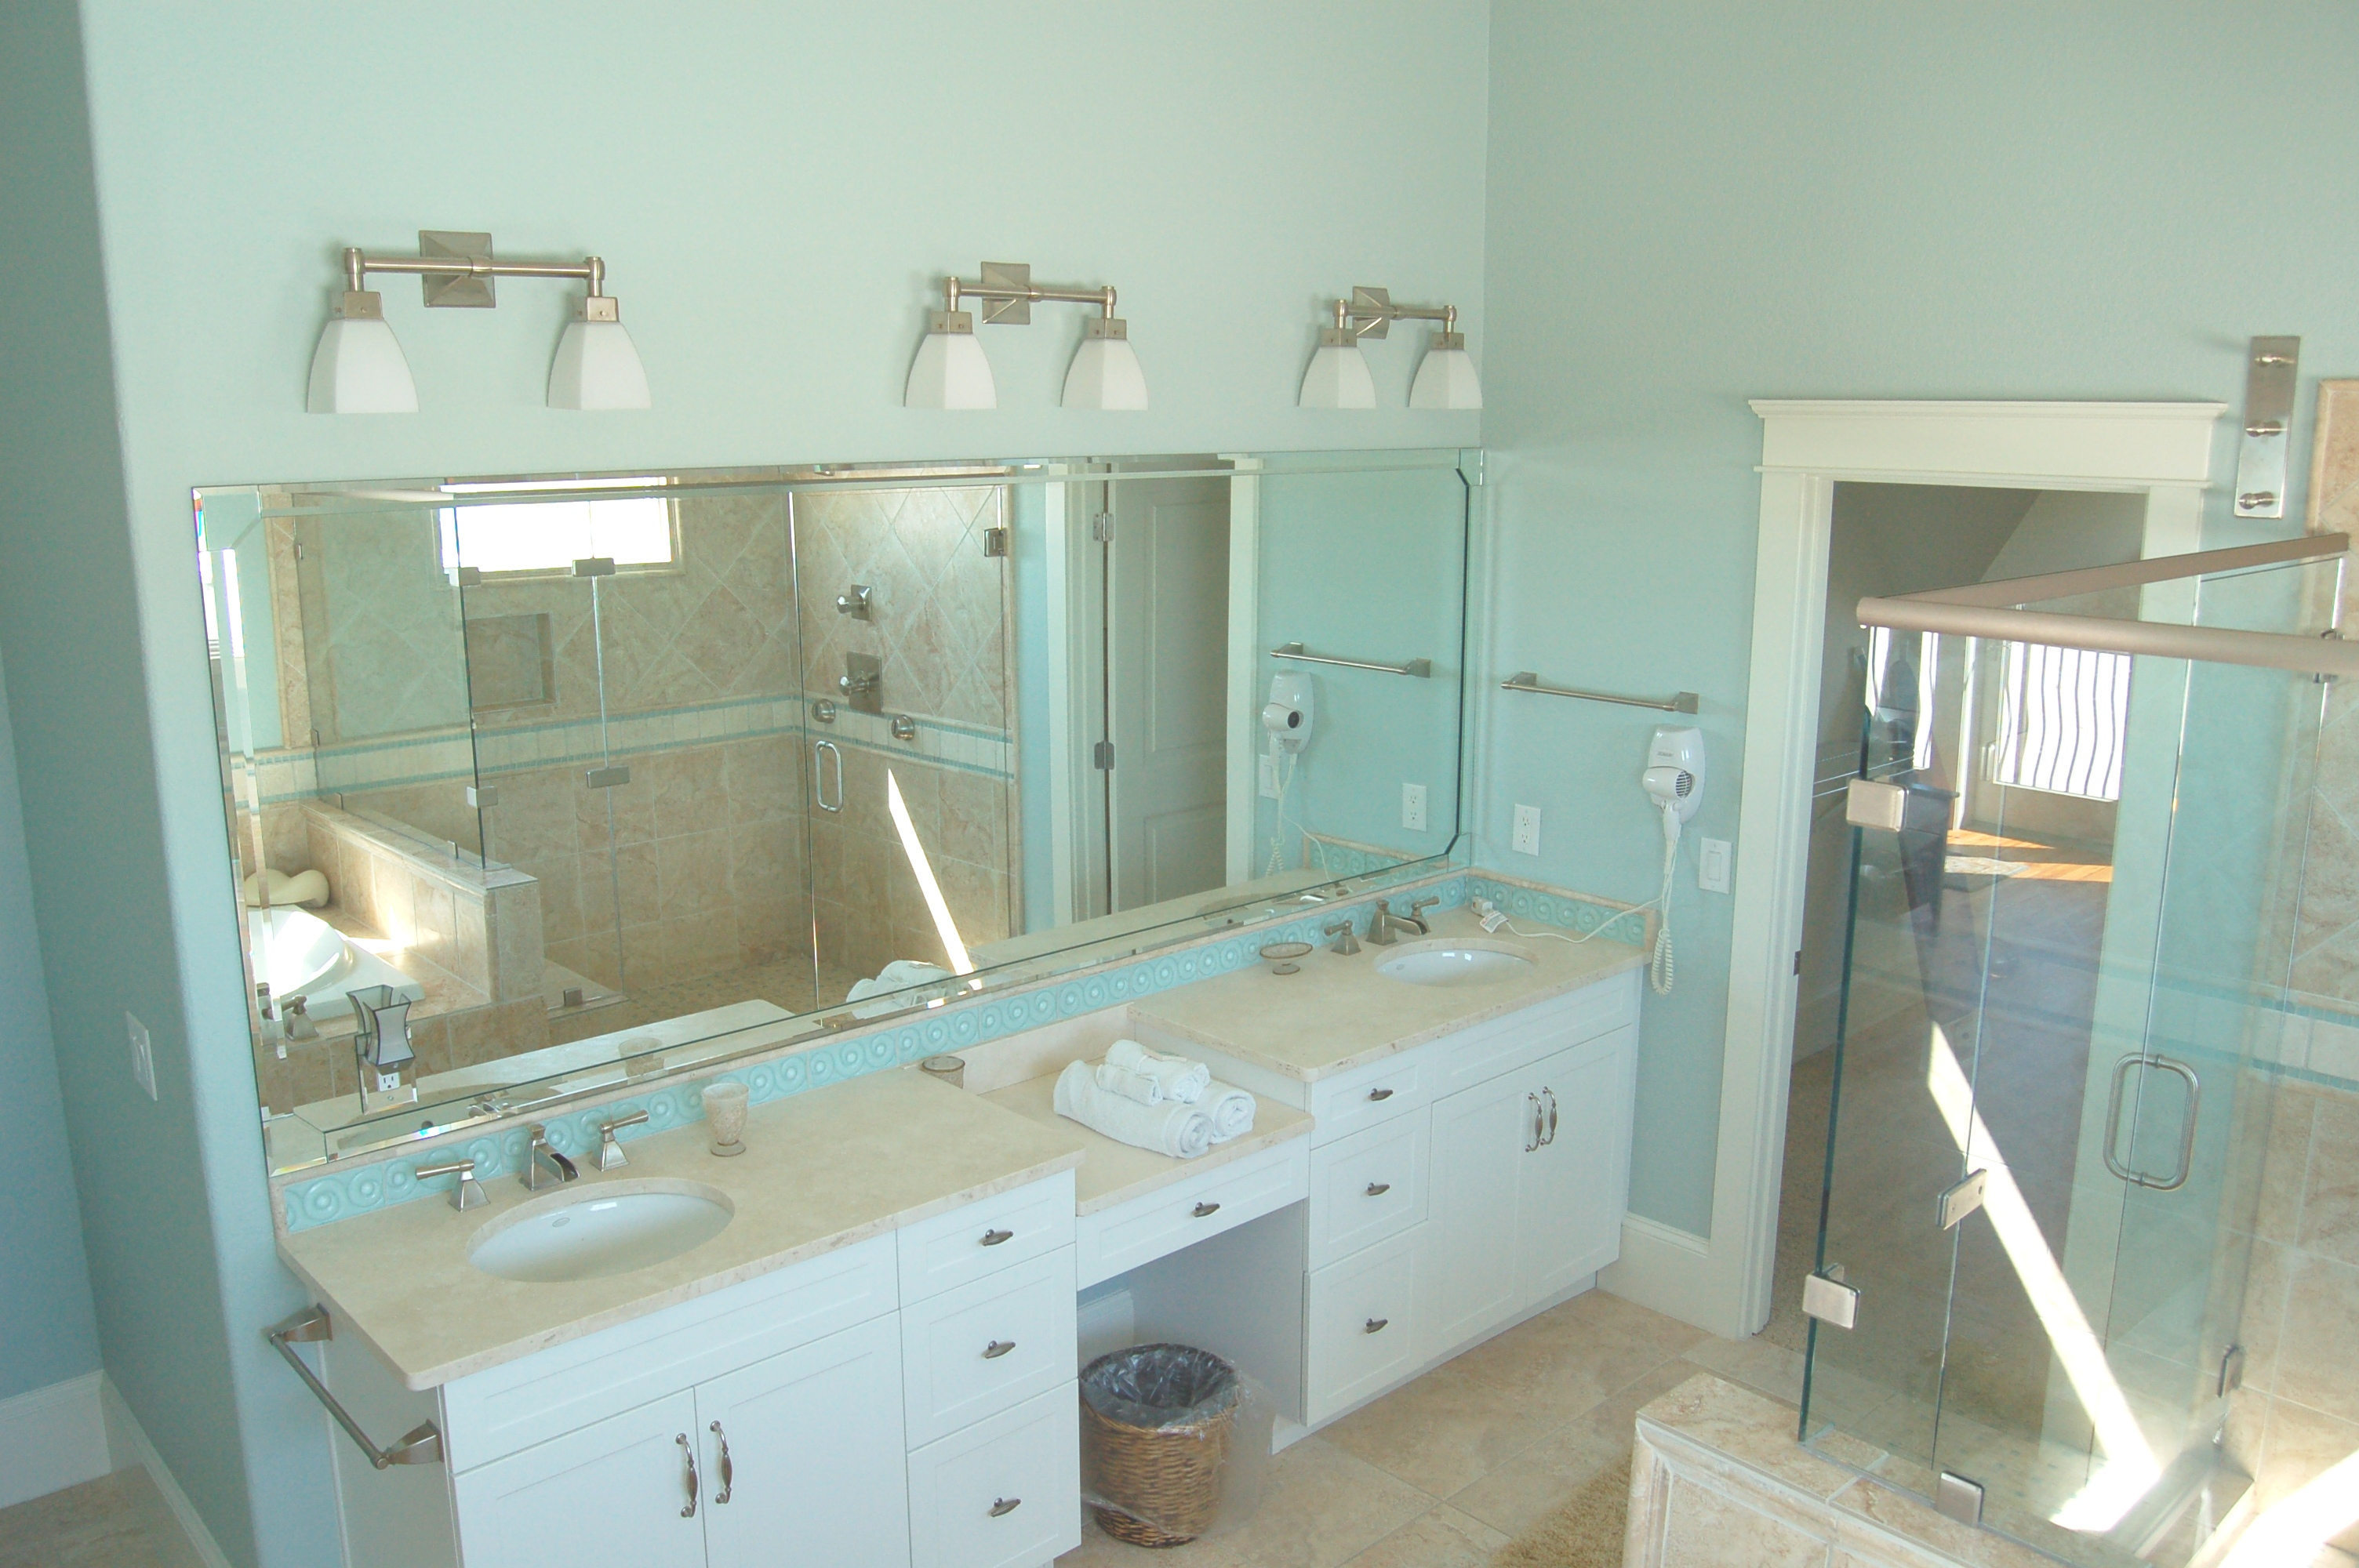 Old Fashioned Aquatec Bath Lift Pictures - Bathtub Ideas - dilata.info